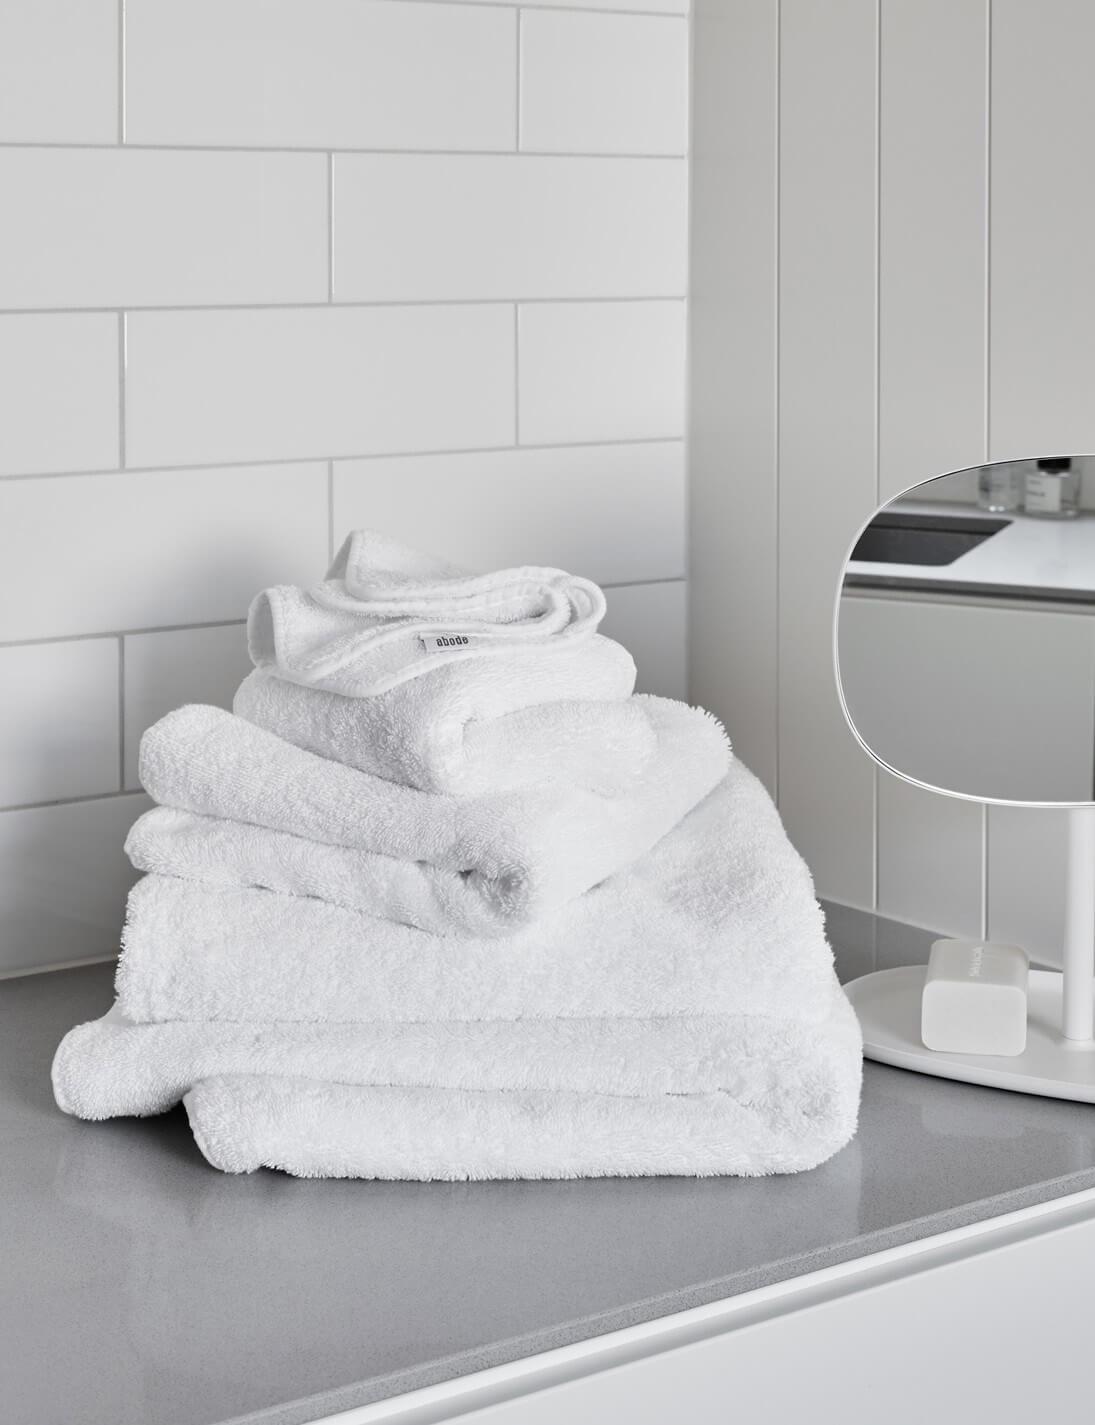 est living design directory abode living primo towel 700.05